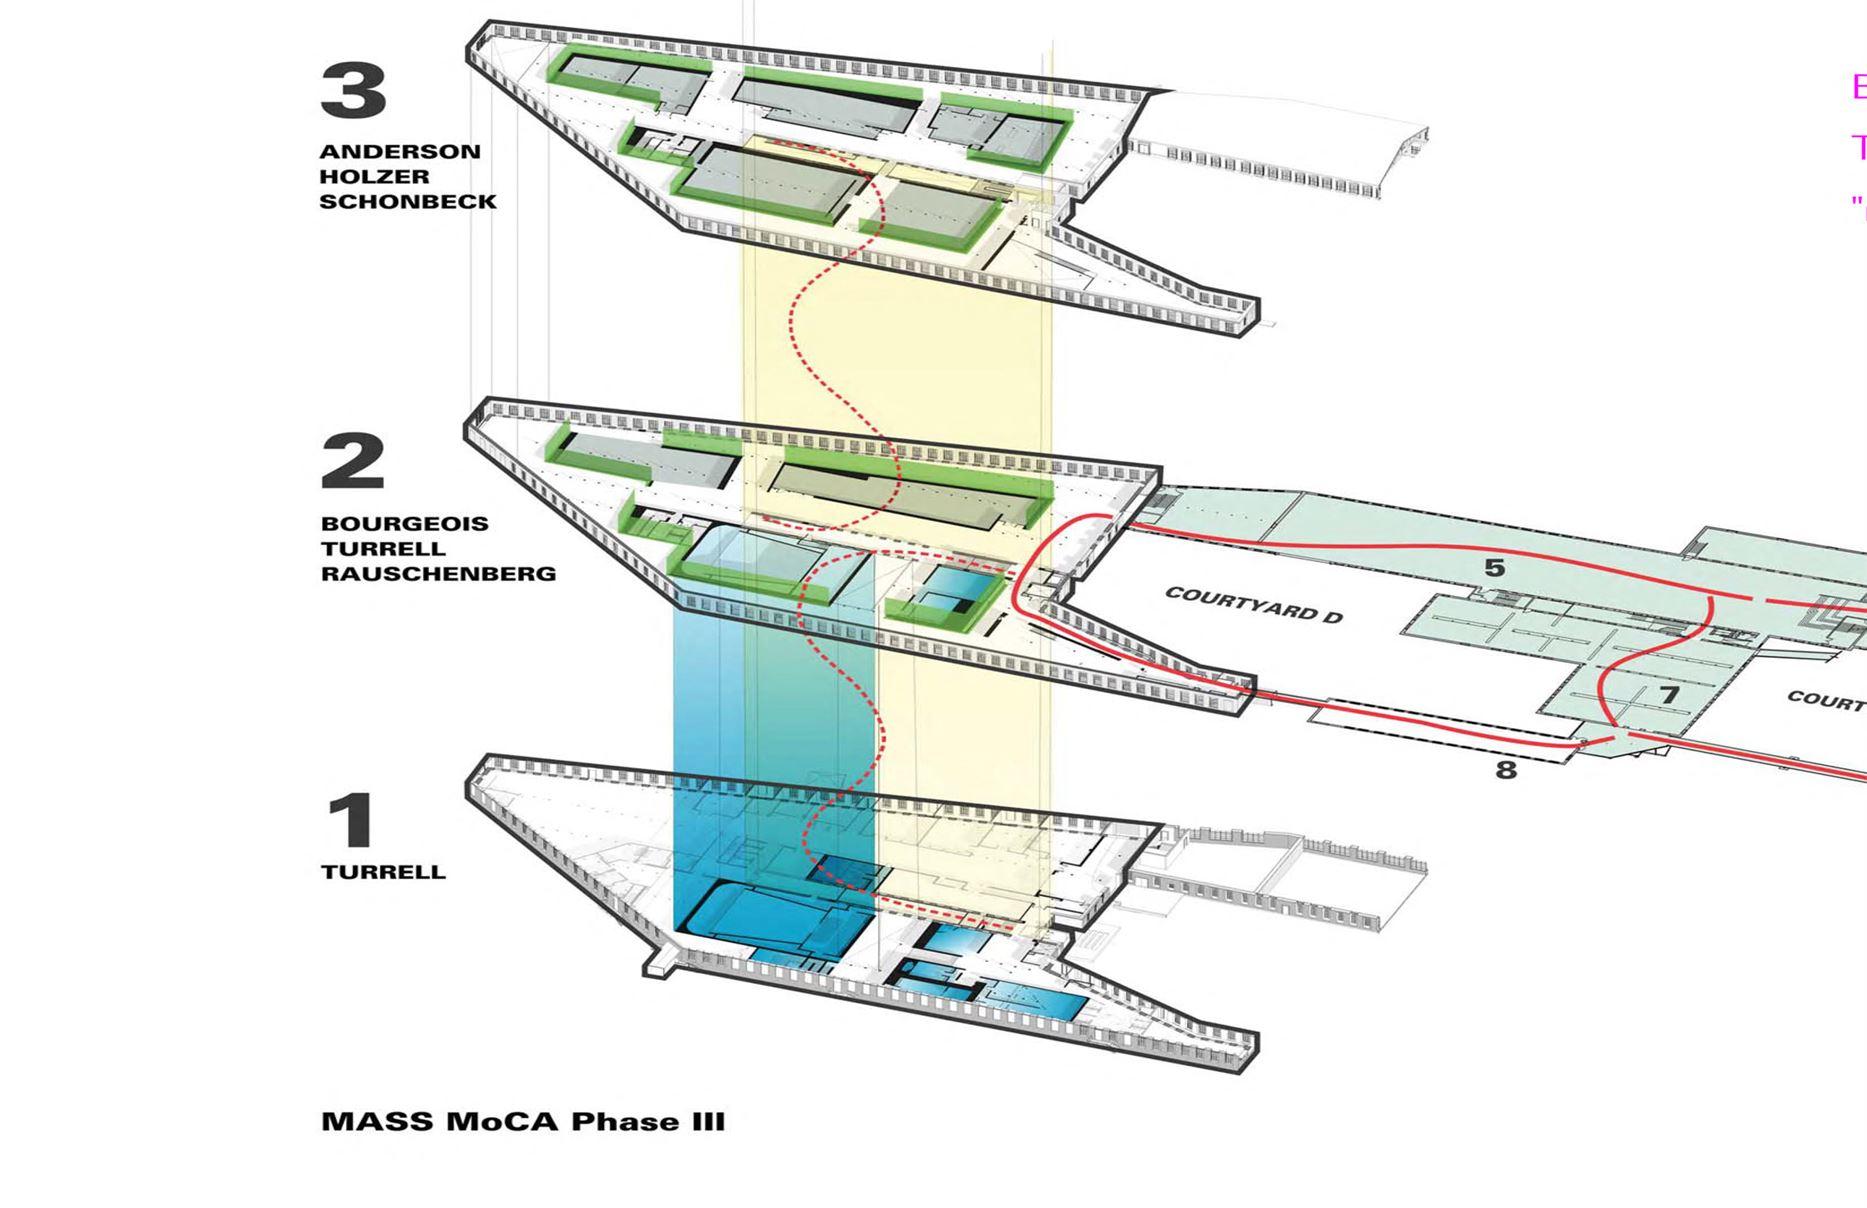 floor-plan-bruner-cott-mass-moca-massachusetts-museum-of-contemporary-art-museum-textile-factory-berkshires-5expansion-renovation_de